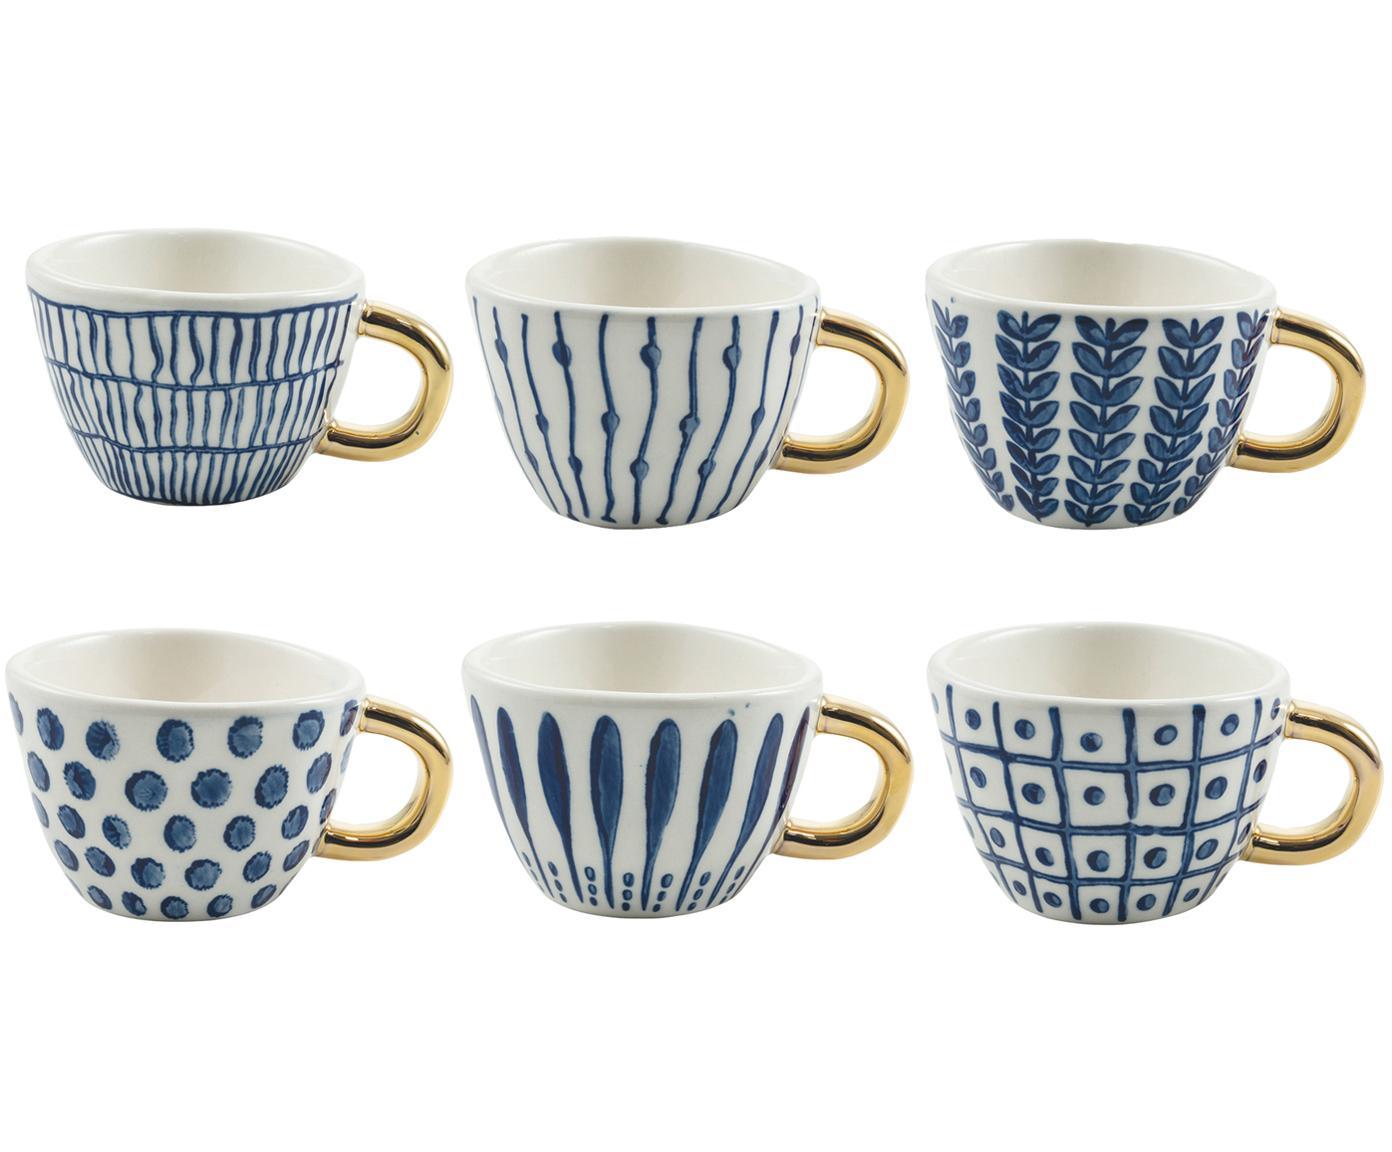 Koffiekopjes-set Masai, 6-delig, Keramiek, Blauw, wit, goudkleurig, Ø 7 x H 5 cm